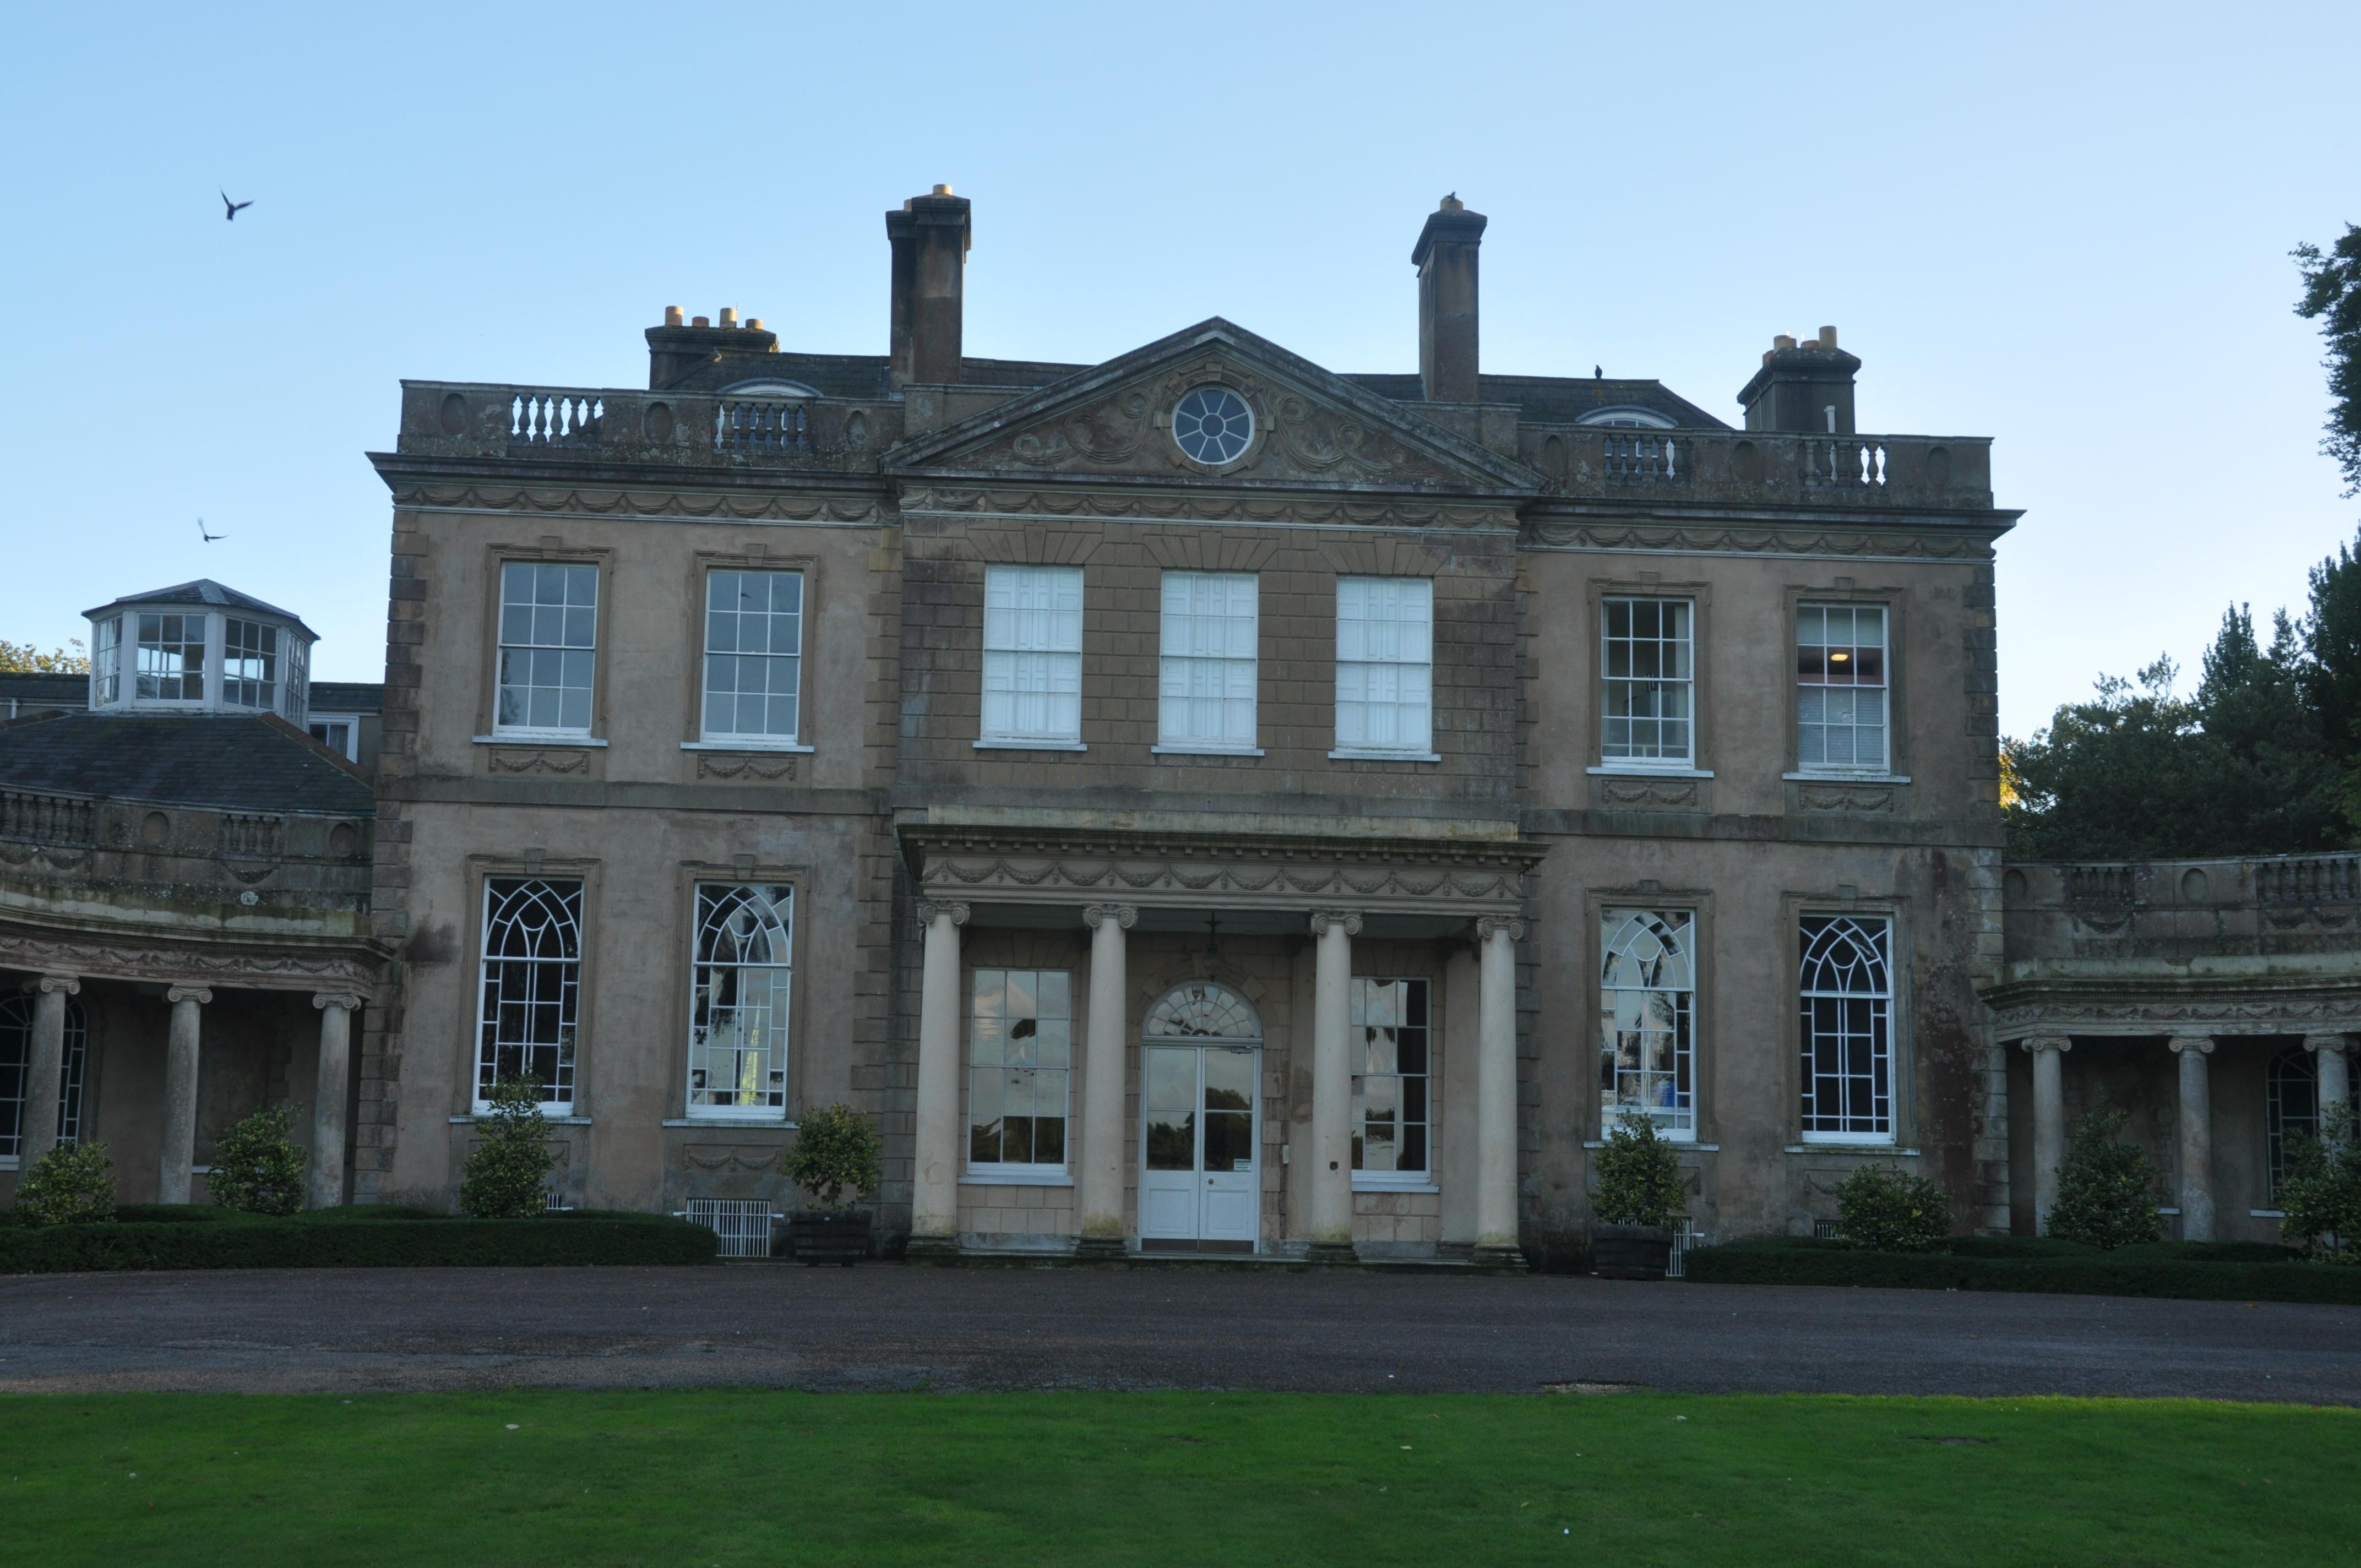 File:Upton House, Poole (2473).jpg